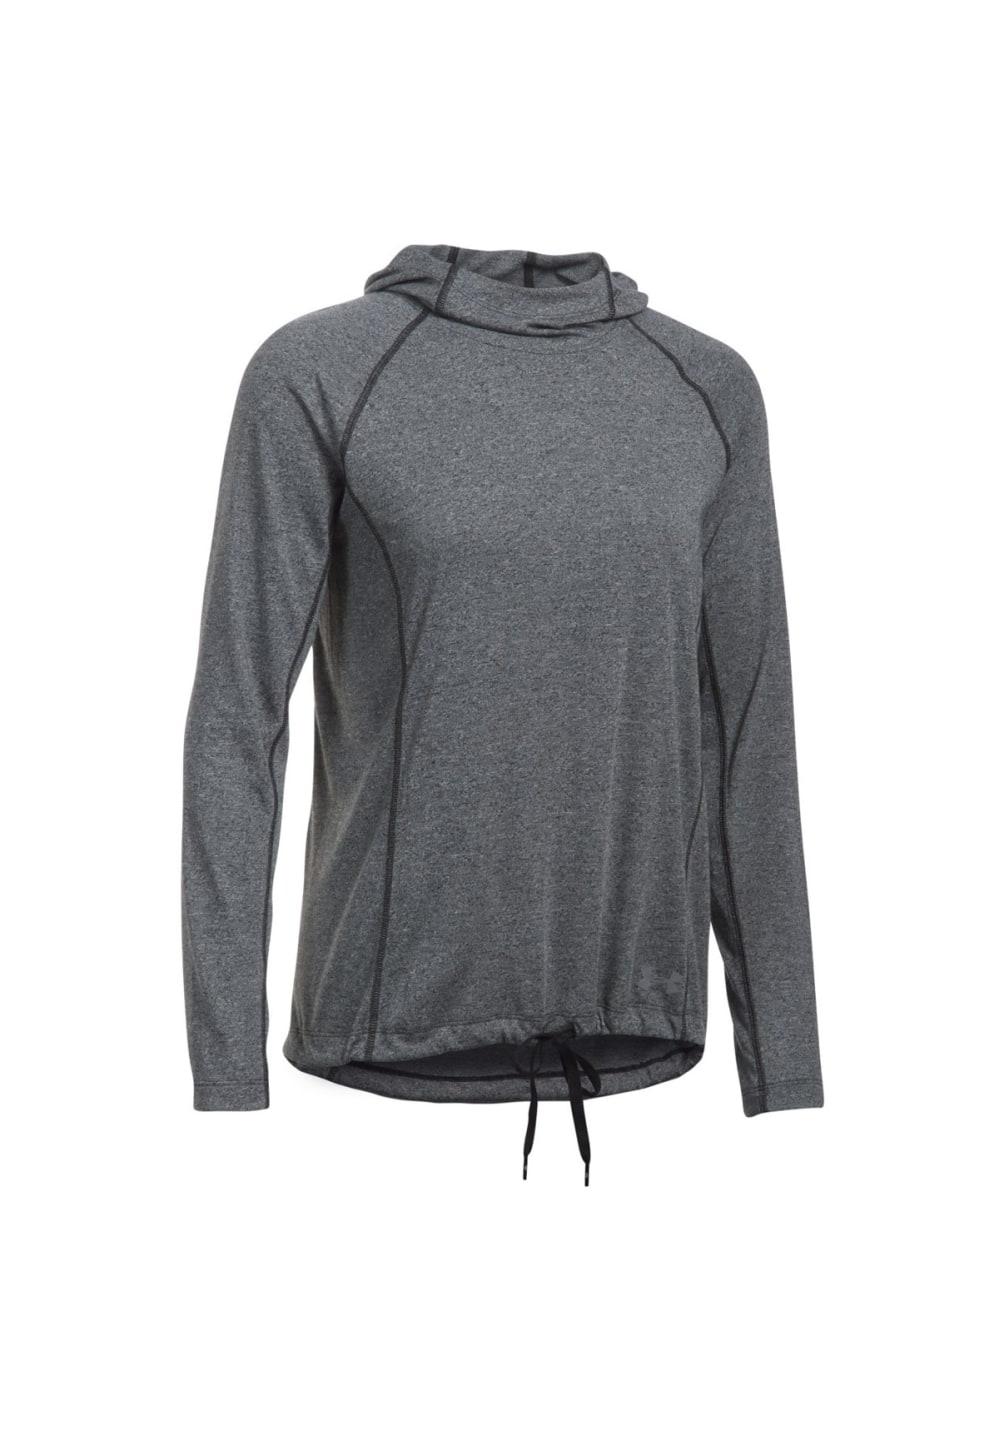 Under Armour Threadborne Train Hood Twist Sweatshirts Hoodies for Women Grey